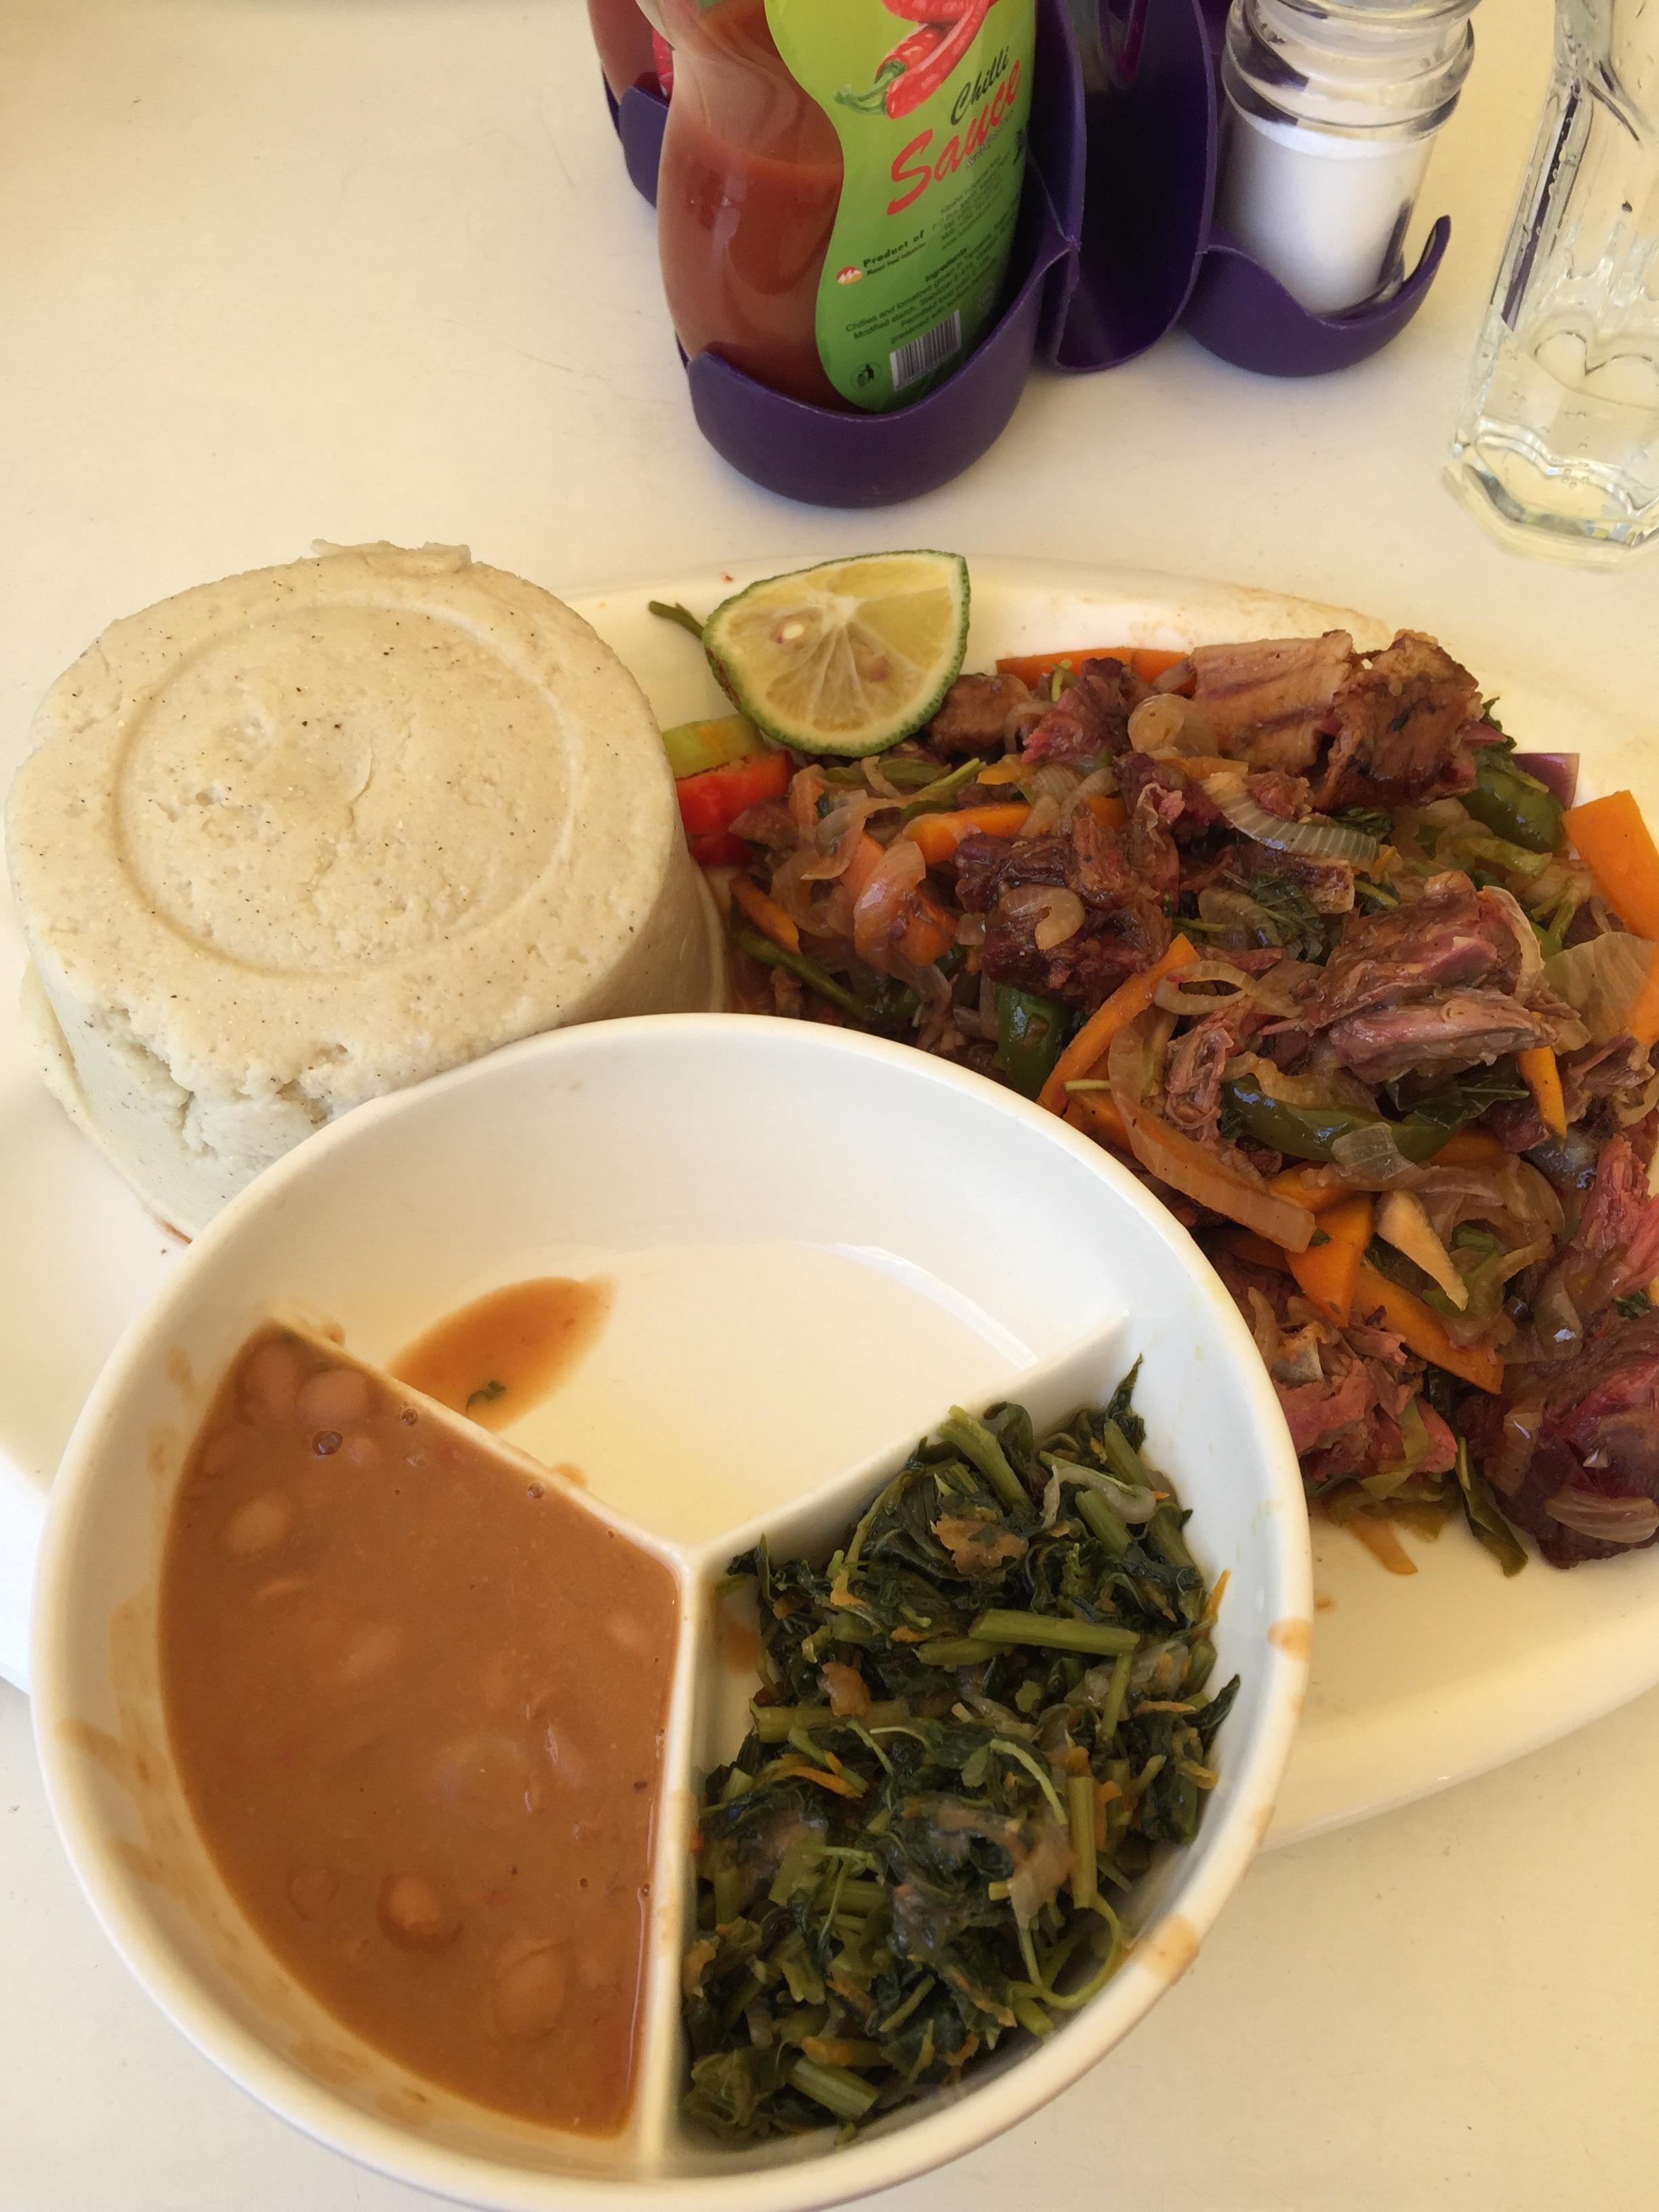 Goat with veggies, beans, greens + ugali (maze = carbs)